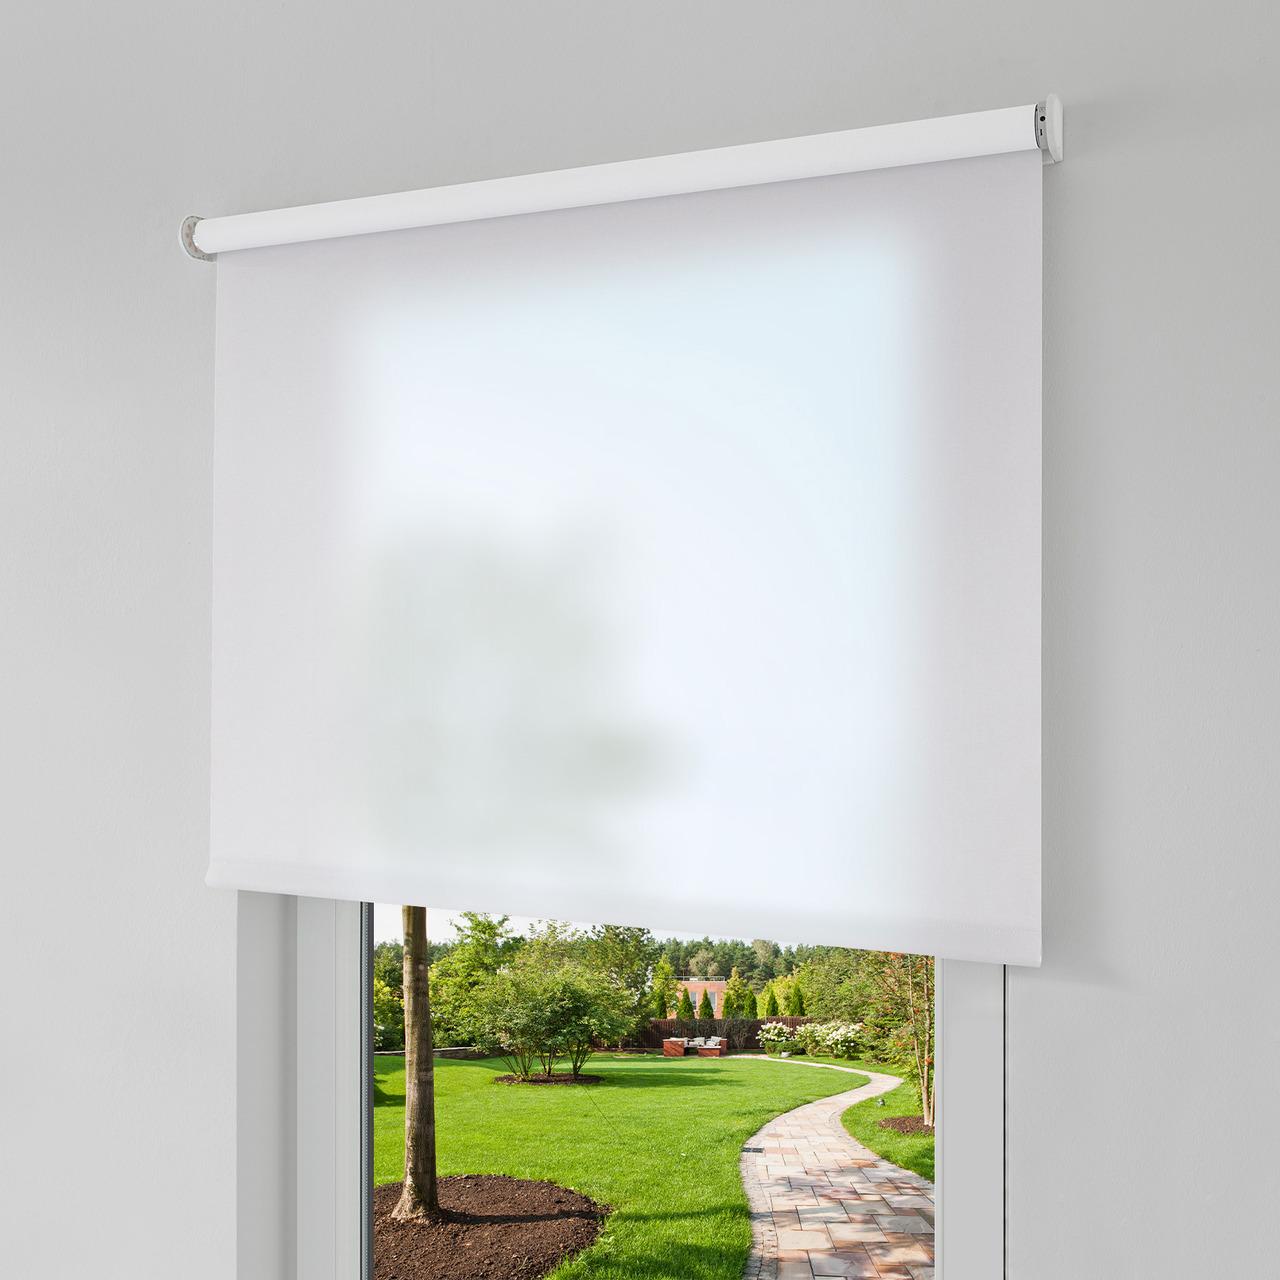 Erfal Smartcontrol Rollo by Homematic IP- 90 x 160 cm (B x H)- halbtransparent tageslicht weiss